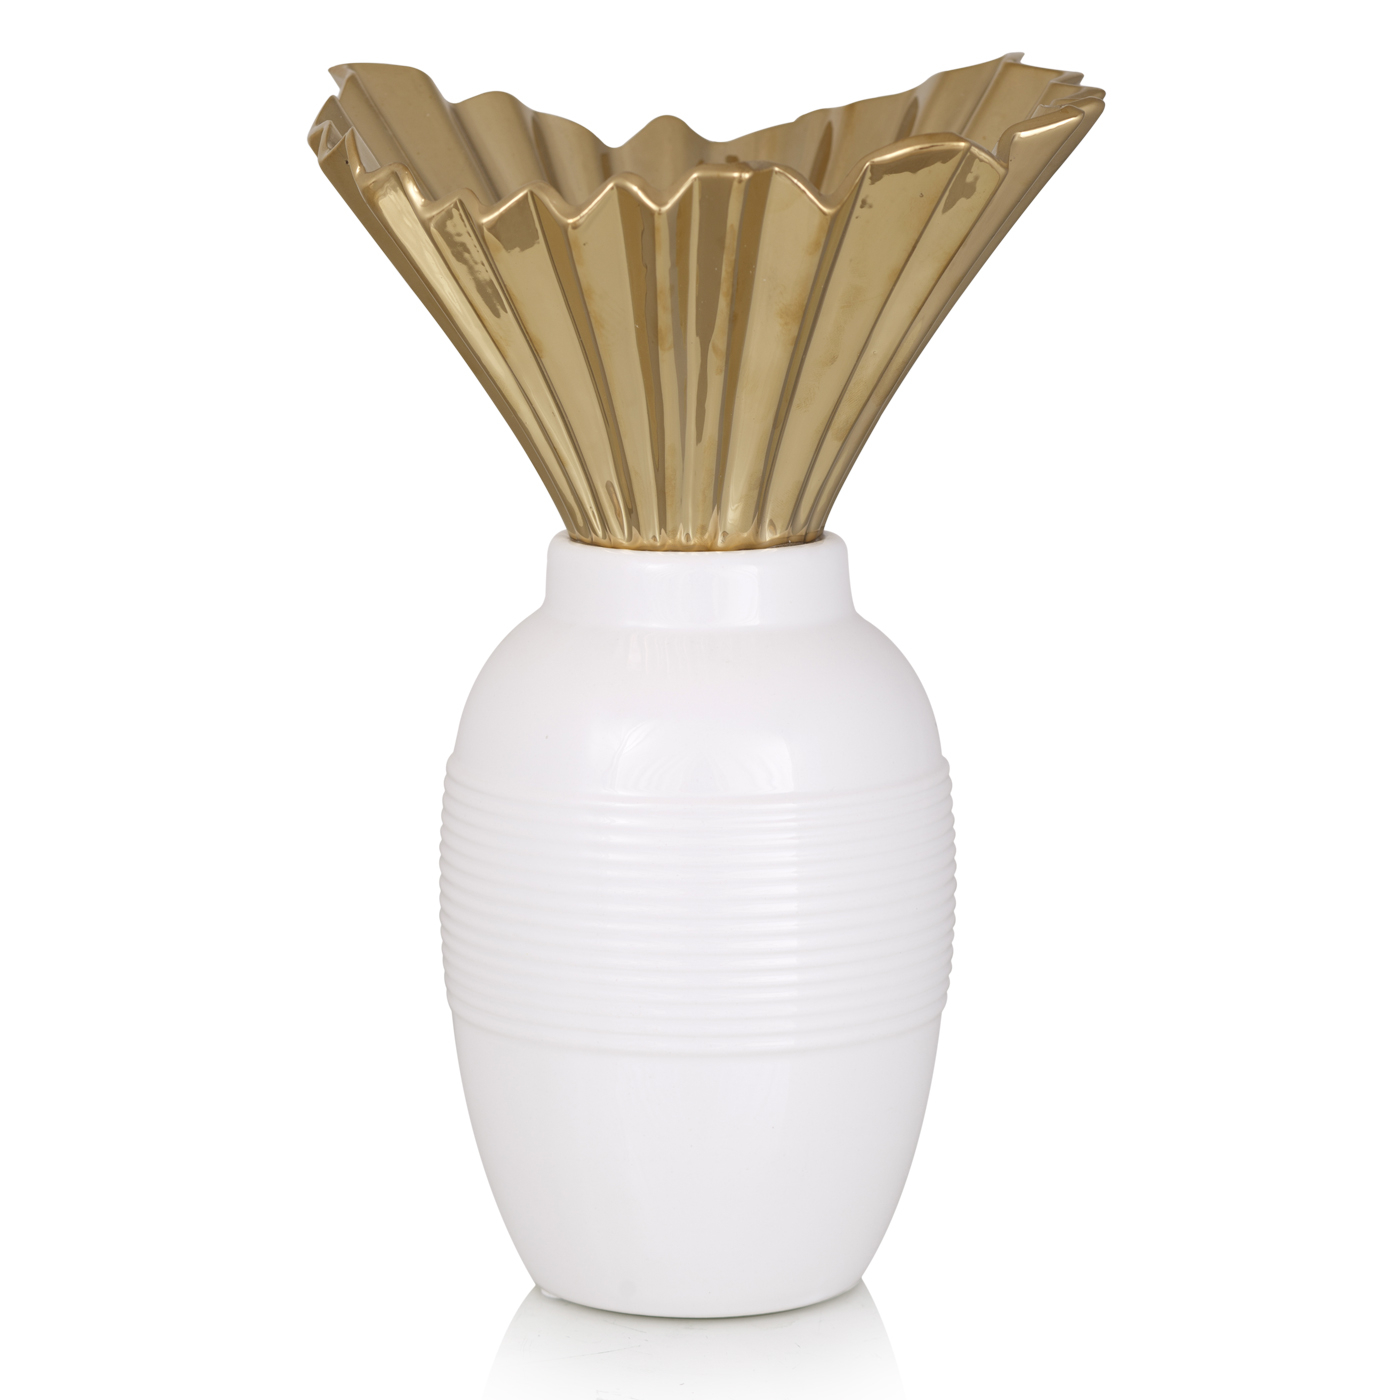 {} Home Philosophy Ваза Daisy (18х21х32 см) ваза керамика розовый рассвет 18 12 8 5 см 863622